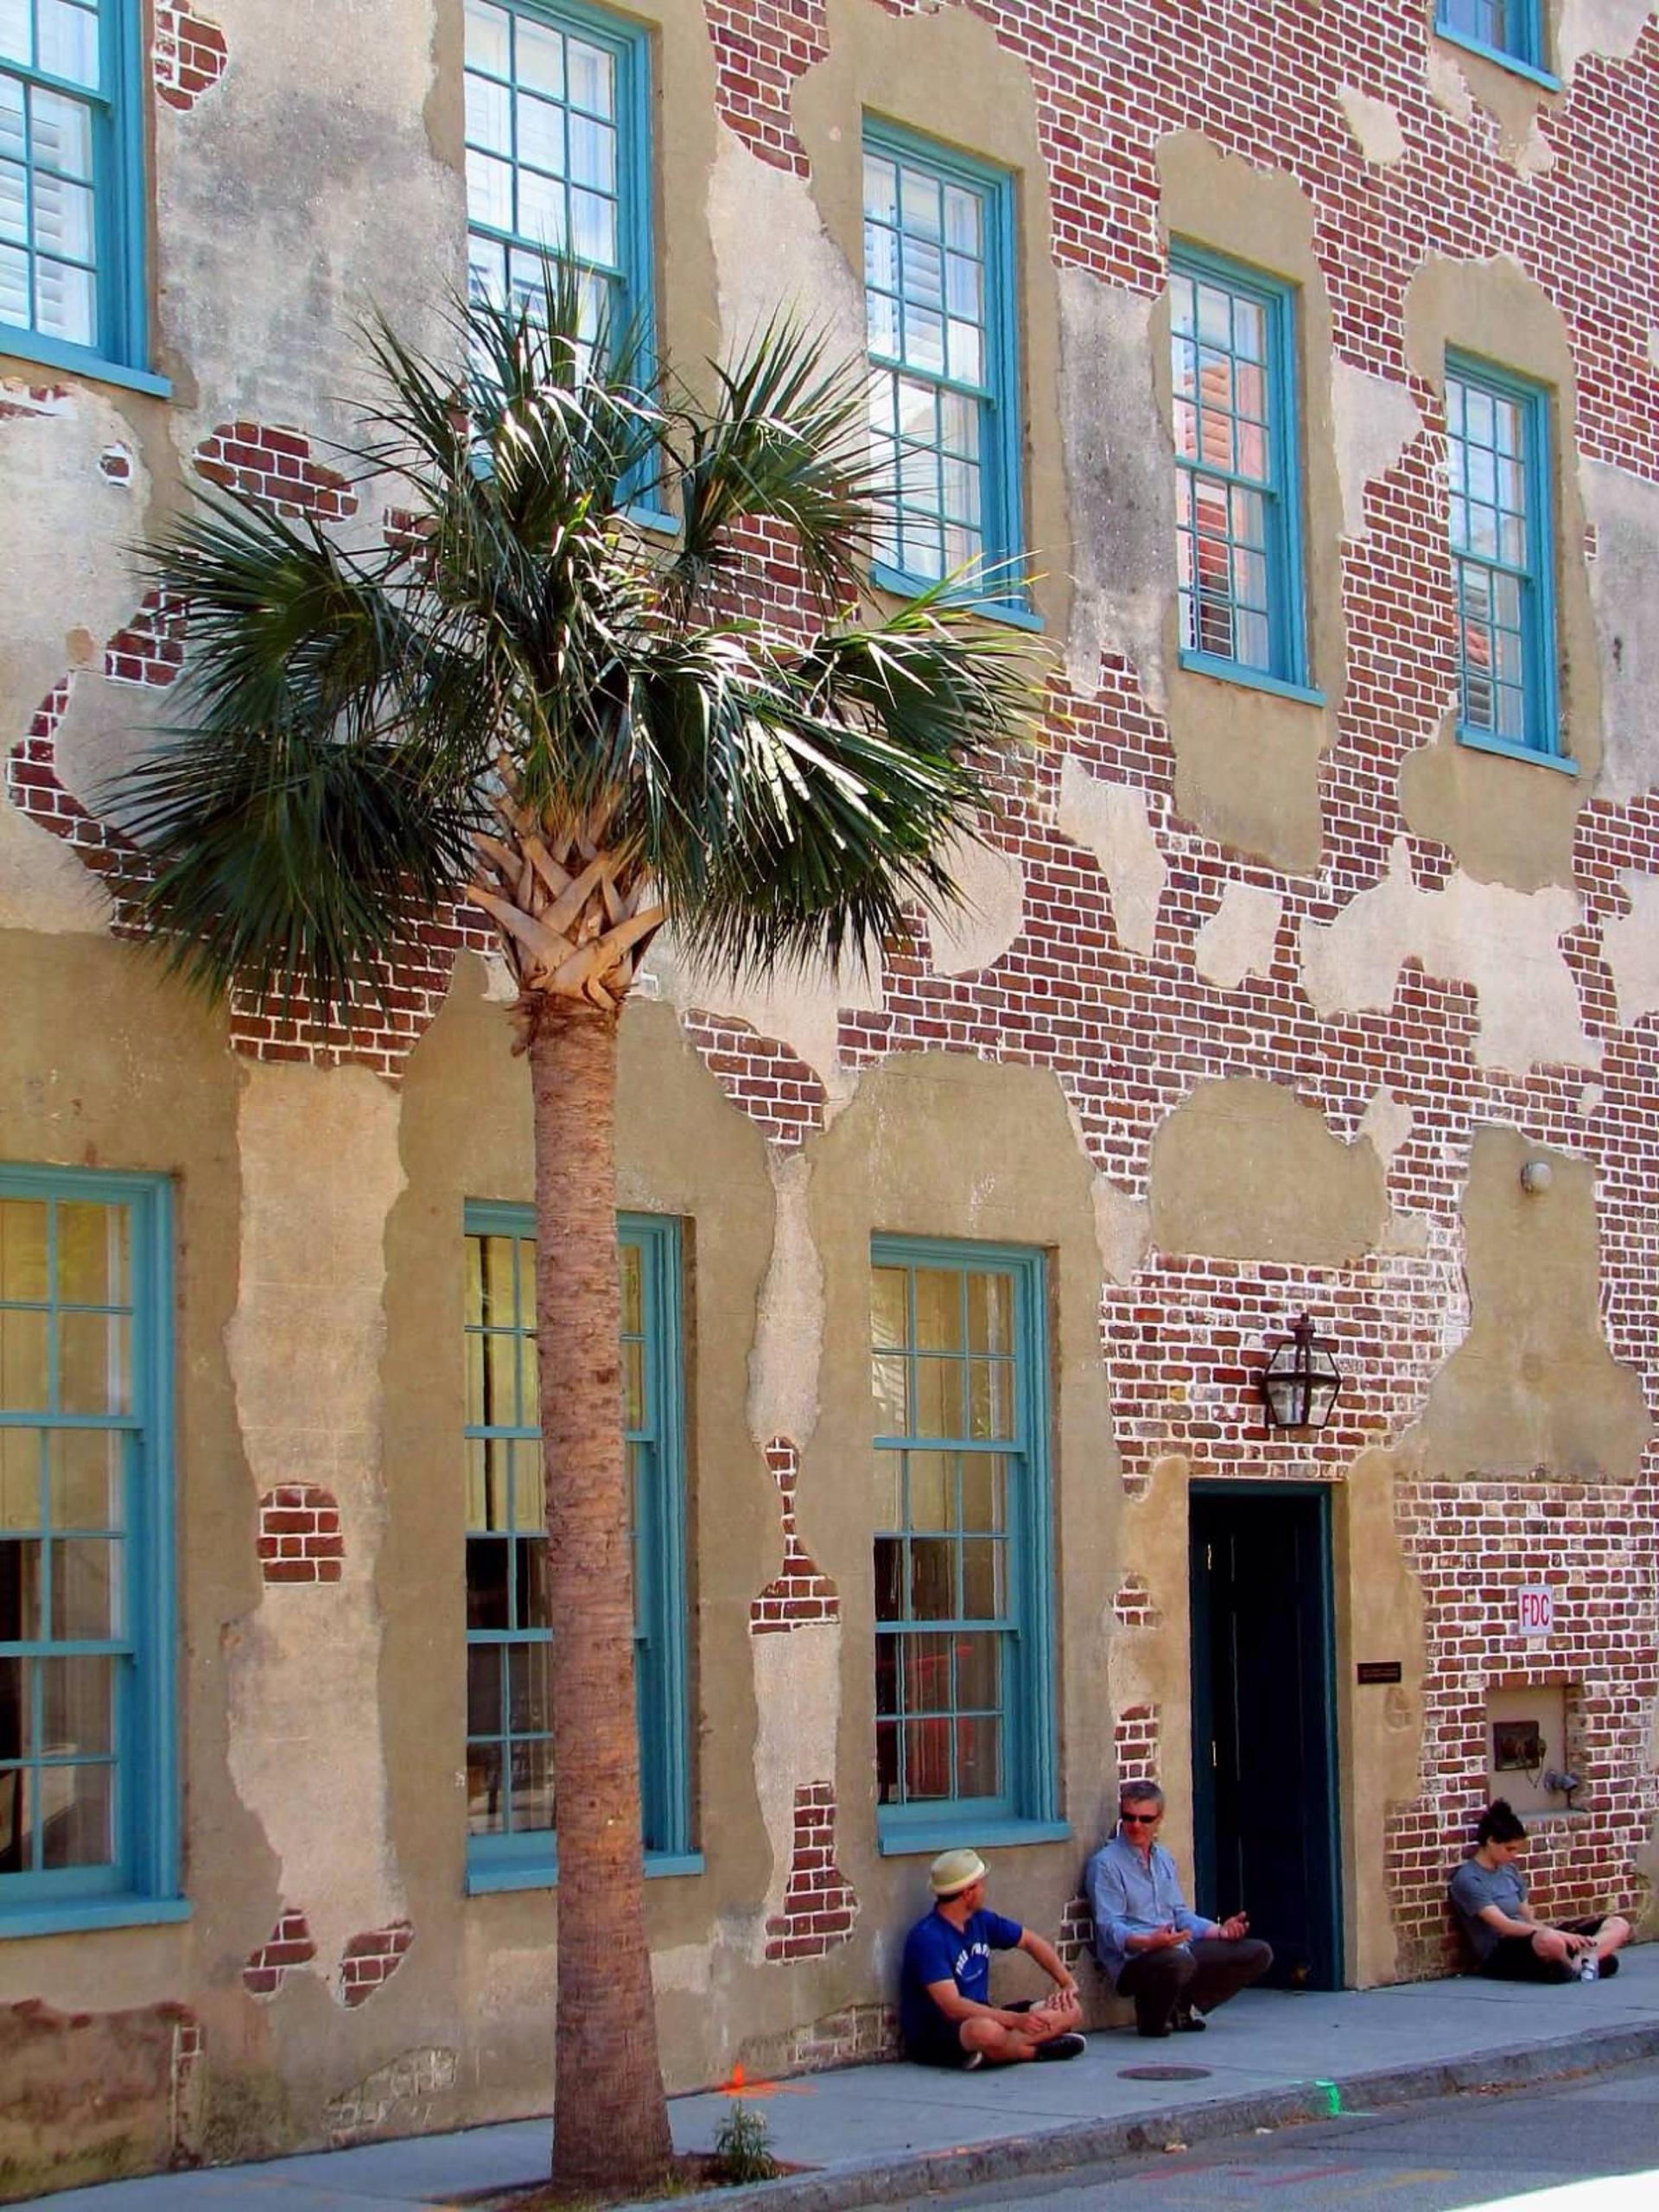 Savannah building | tahitifred, road, stone, street